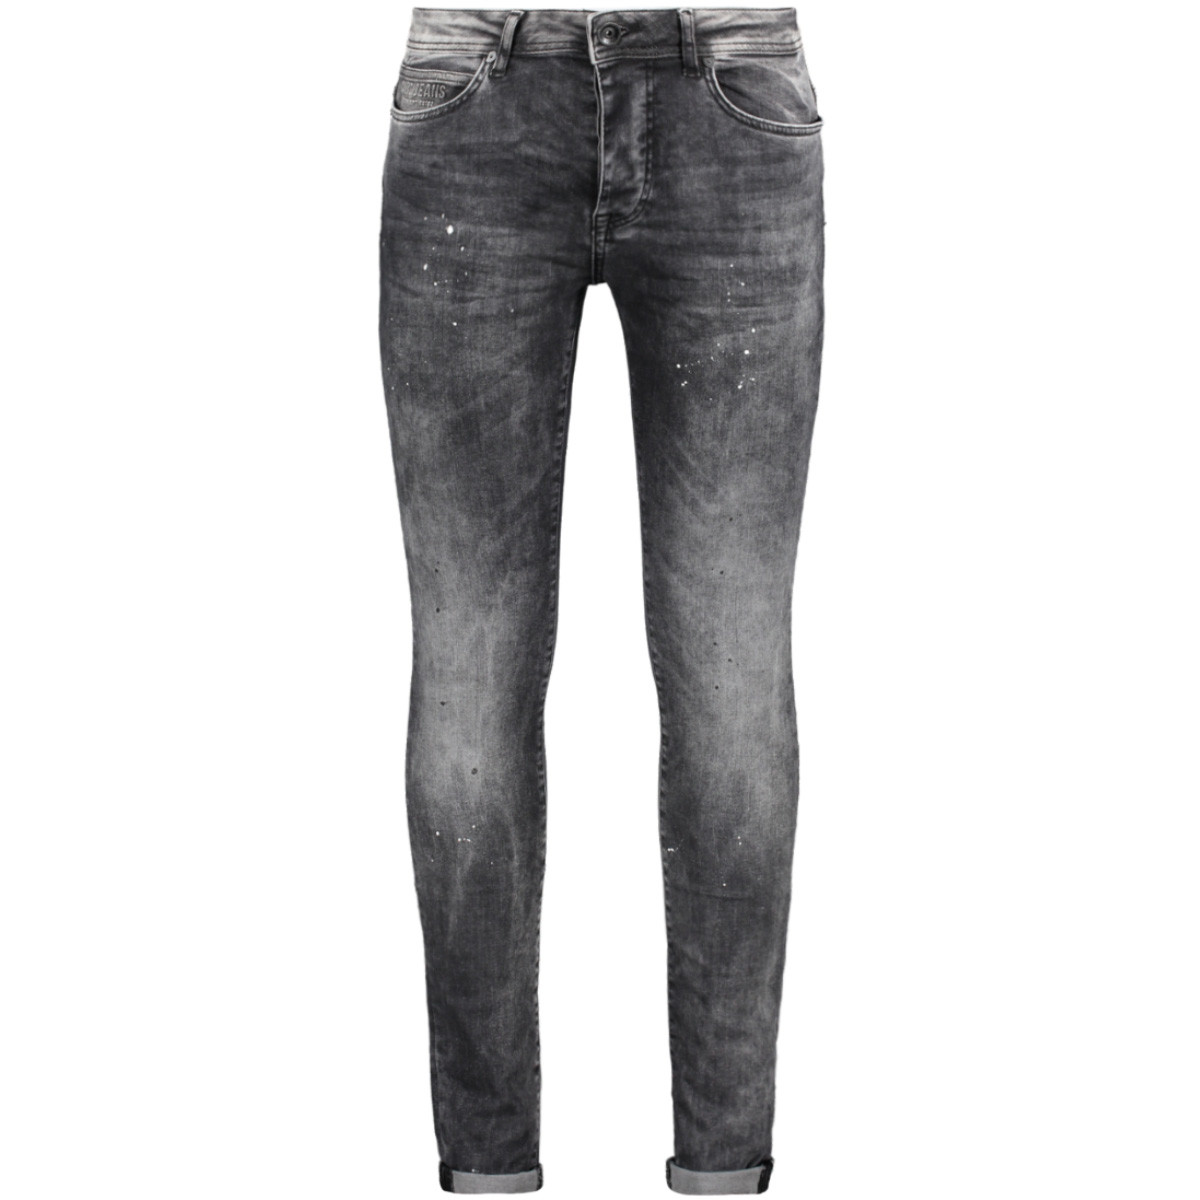 dust super skinny 75528 cars jeans 01 black spot